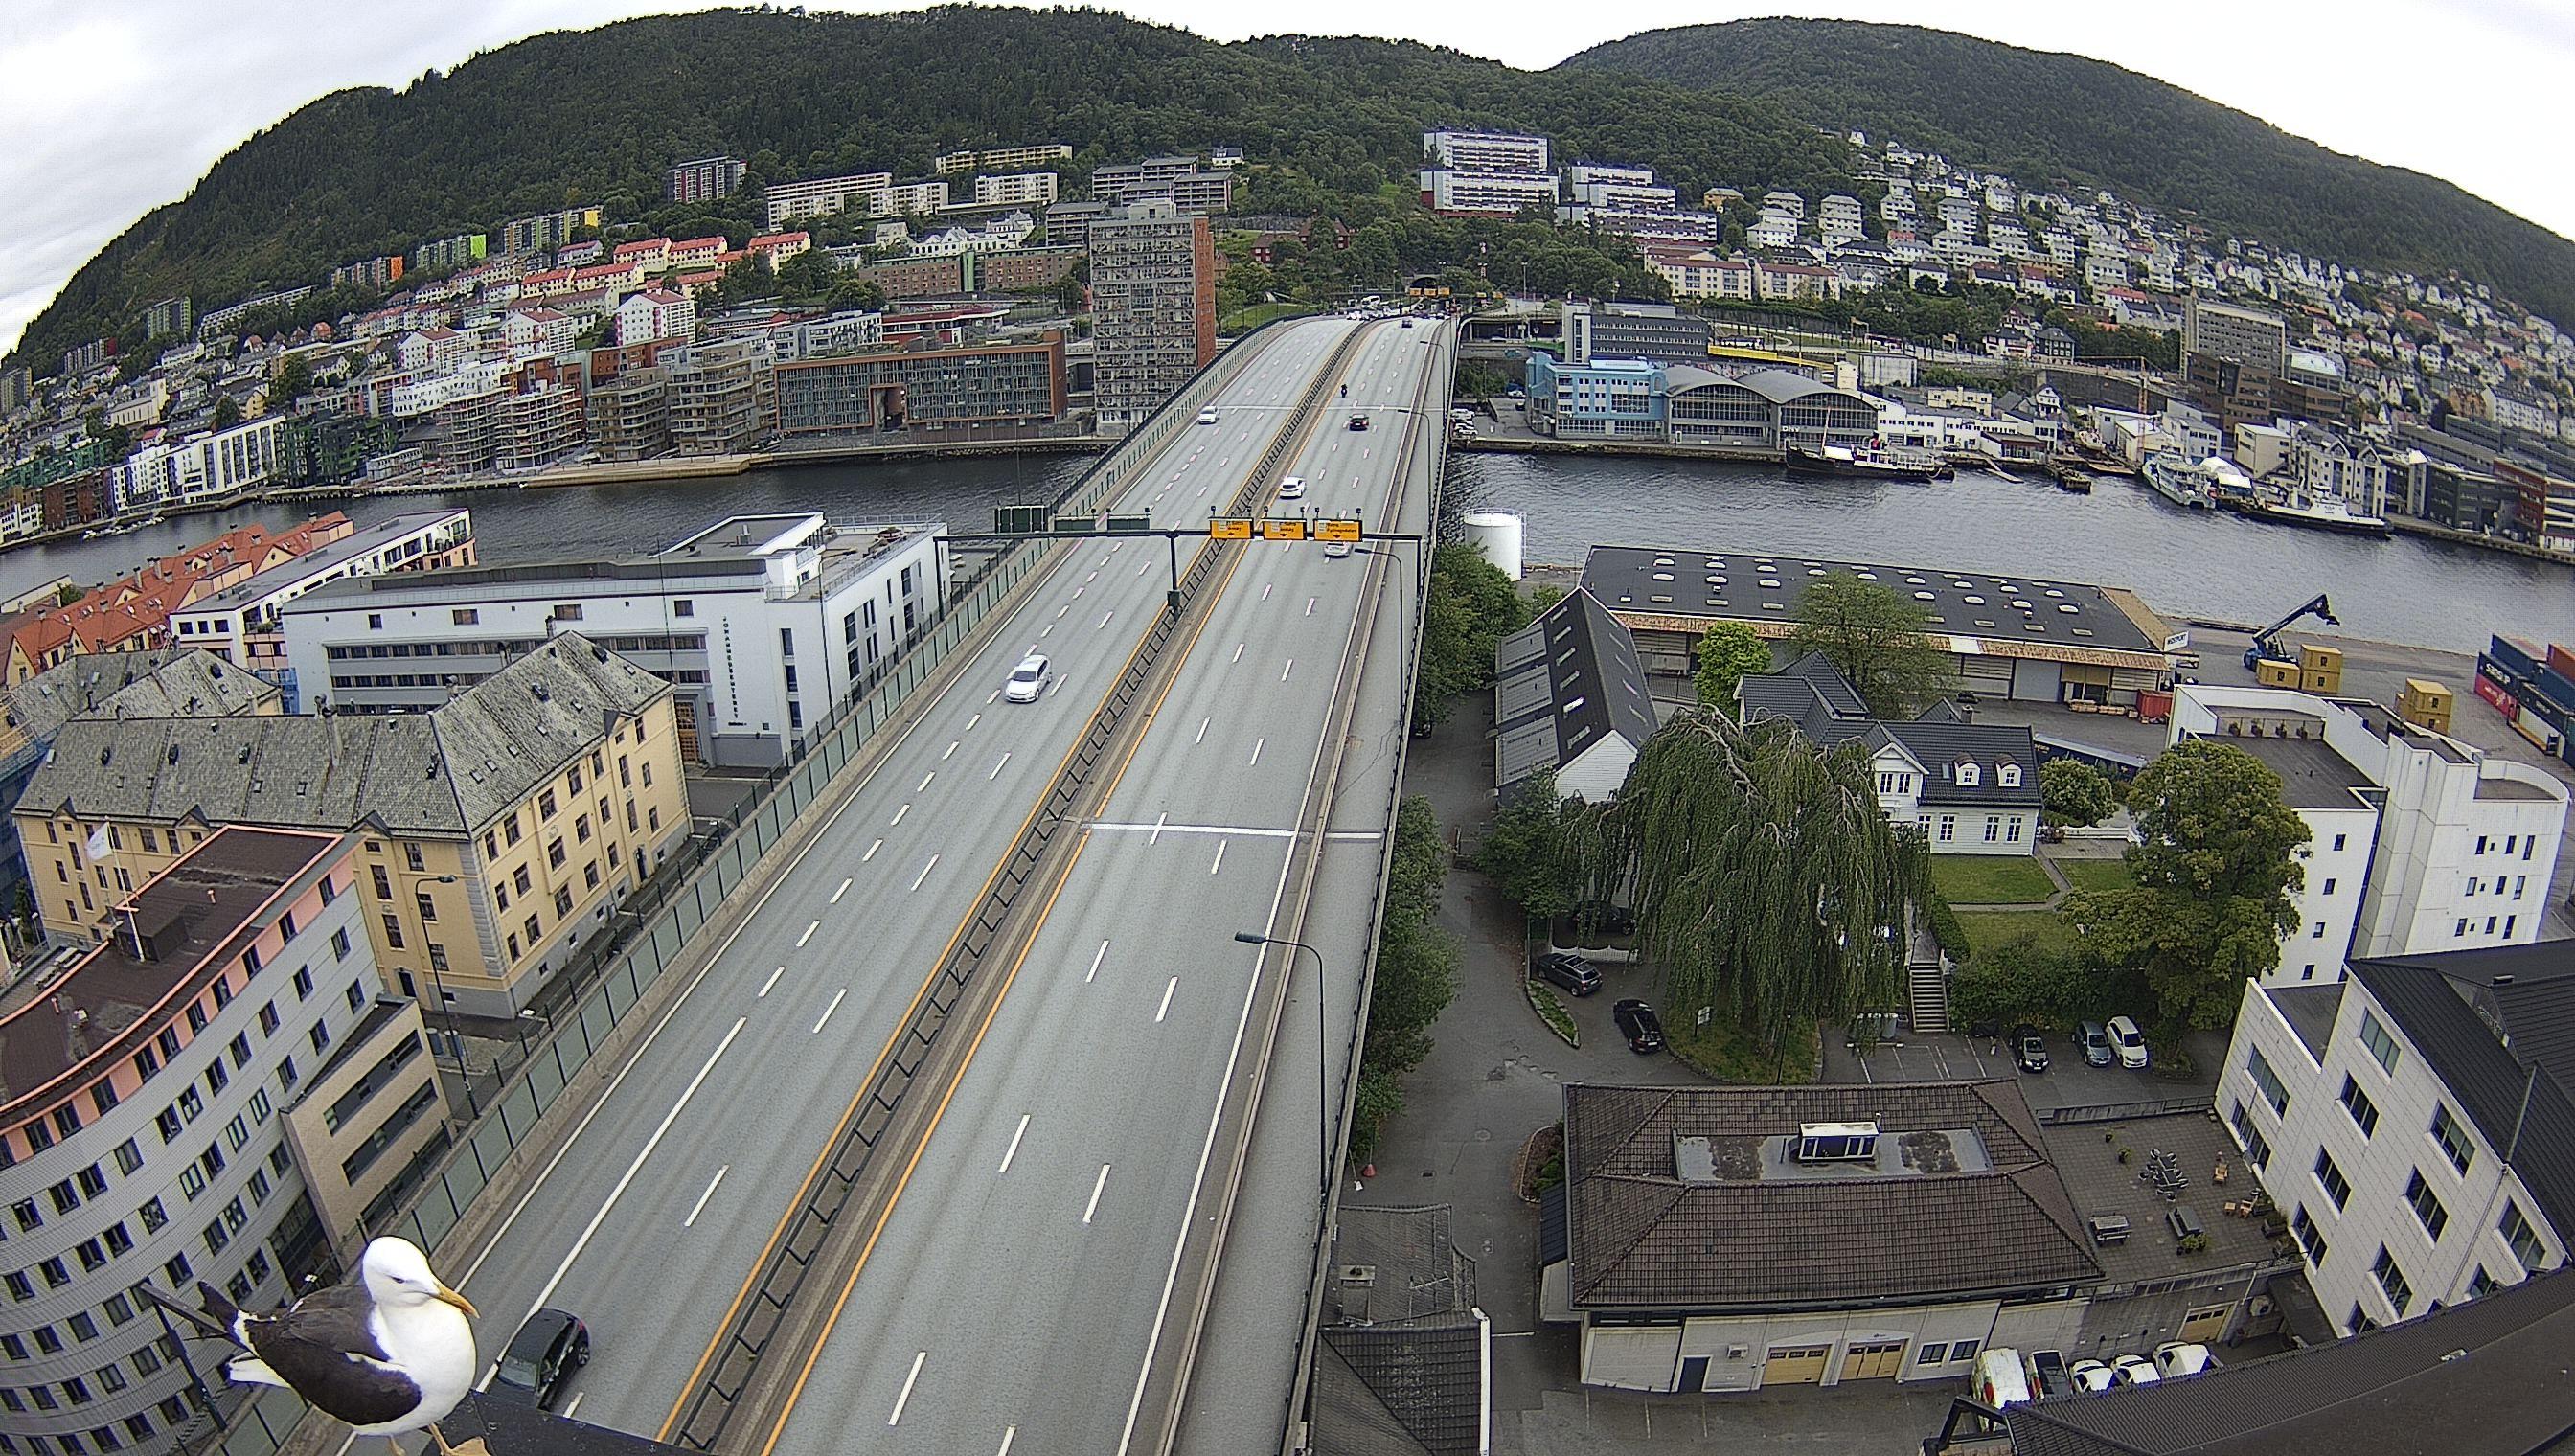 Bergen - Puddefjordsbruen